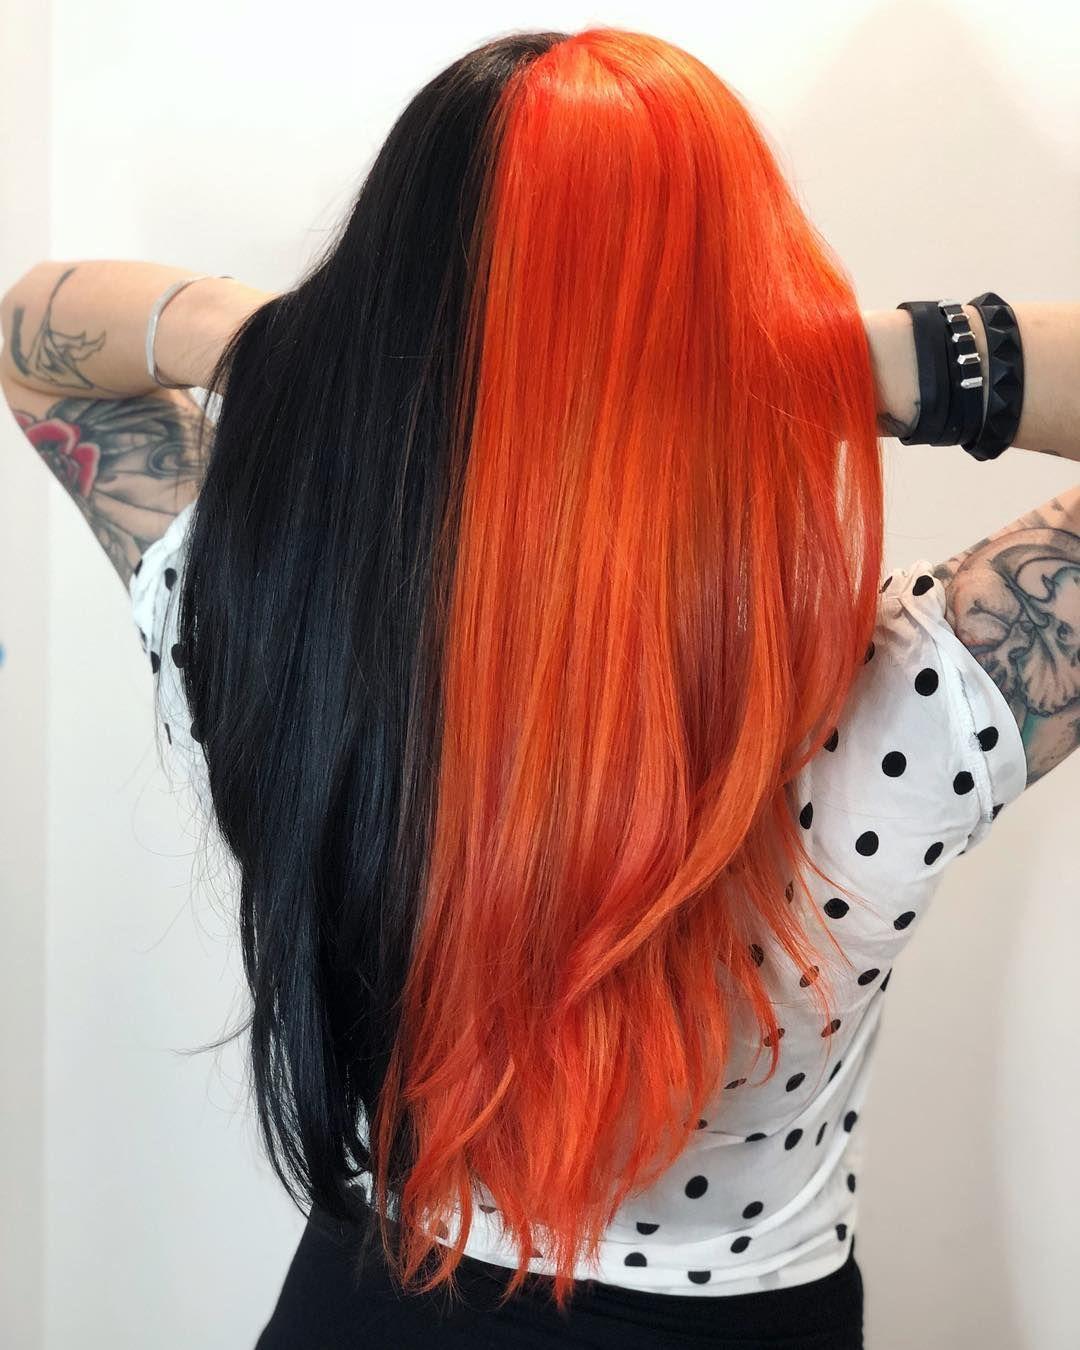 Fresh2death Ya Ll Halloweenprincess Halloween Hair Halfandhalfhair Orangeandblack Halloweenhair Two Color Hair Halloween Hair Dye Split Dyed Hair